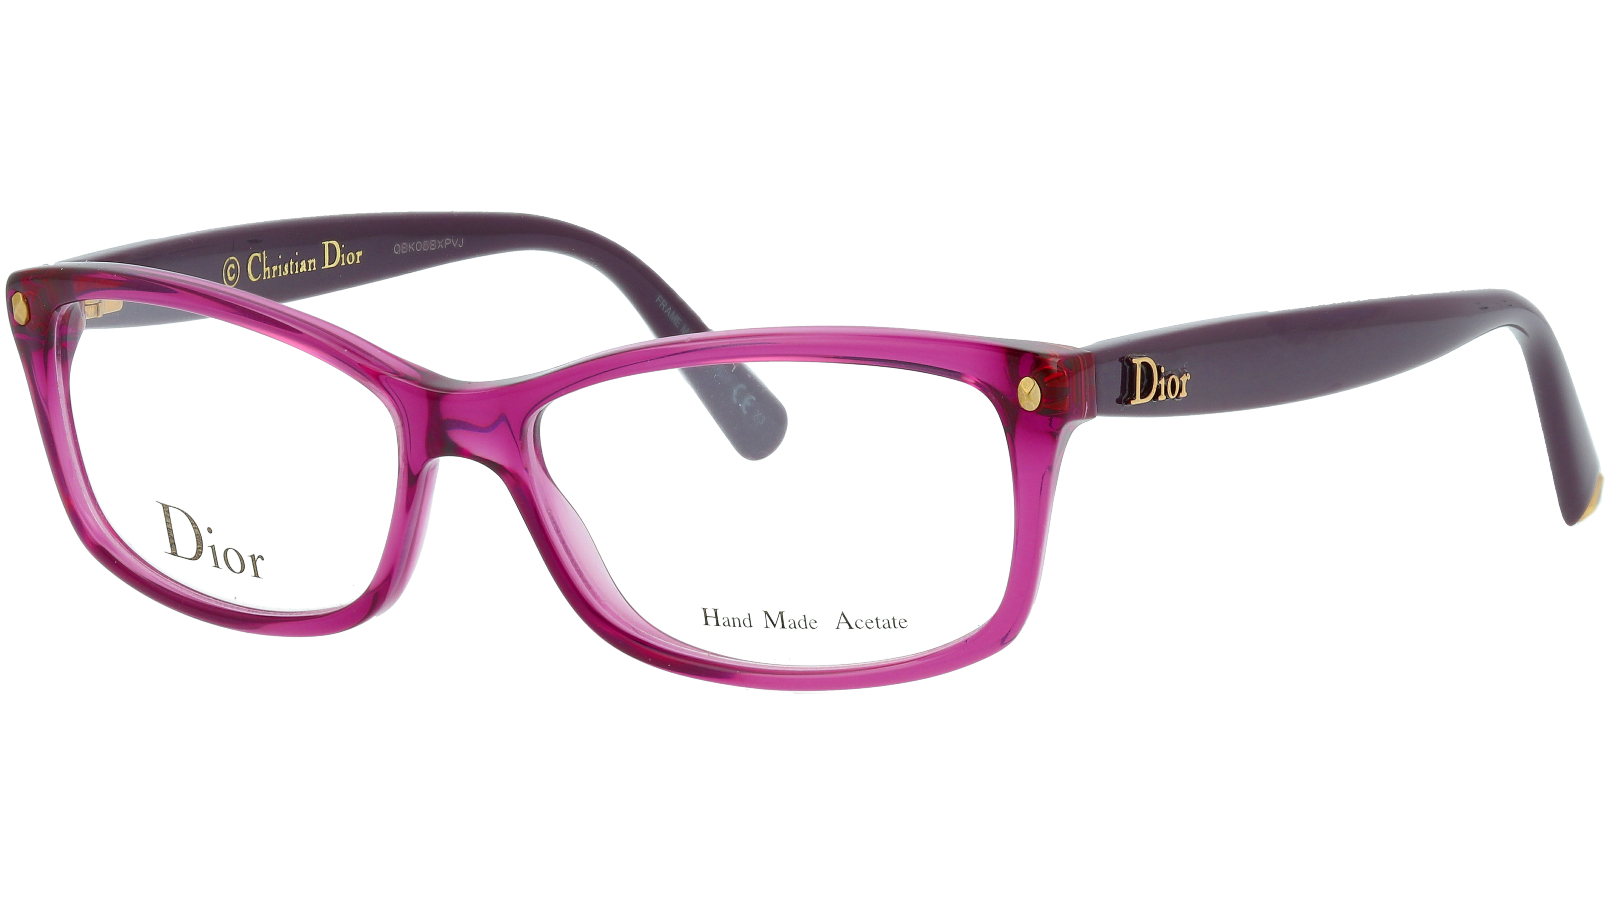 DIOR CD3232 DUW 52 PURPLE Glasses